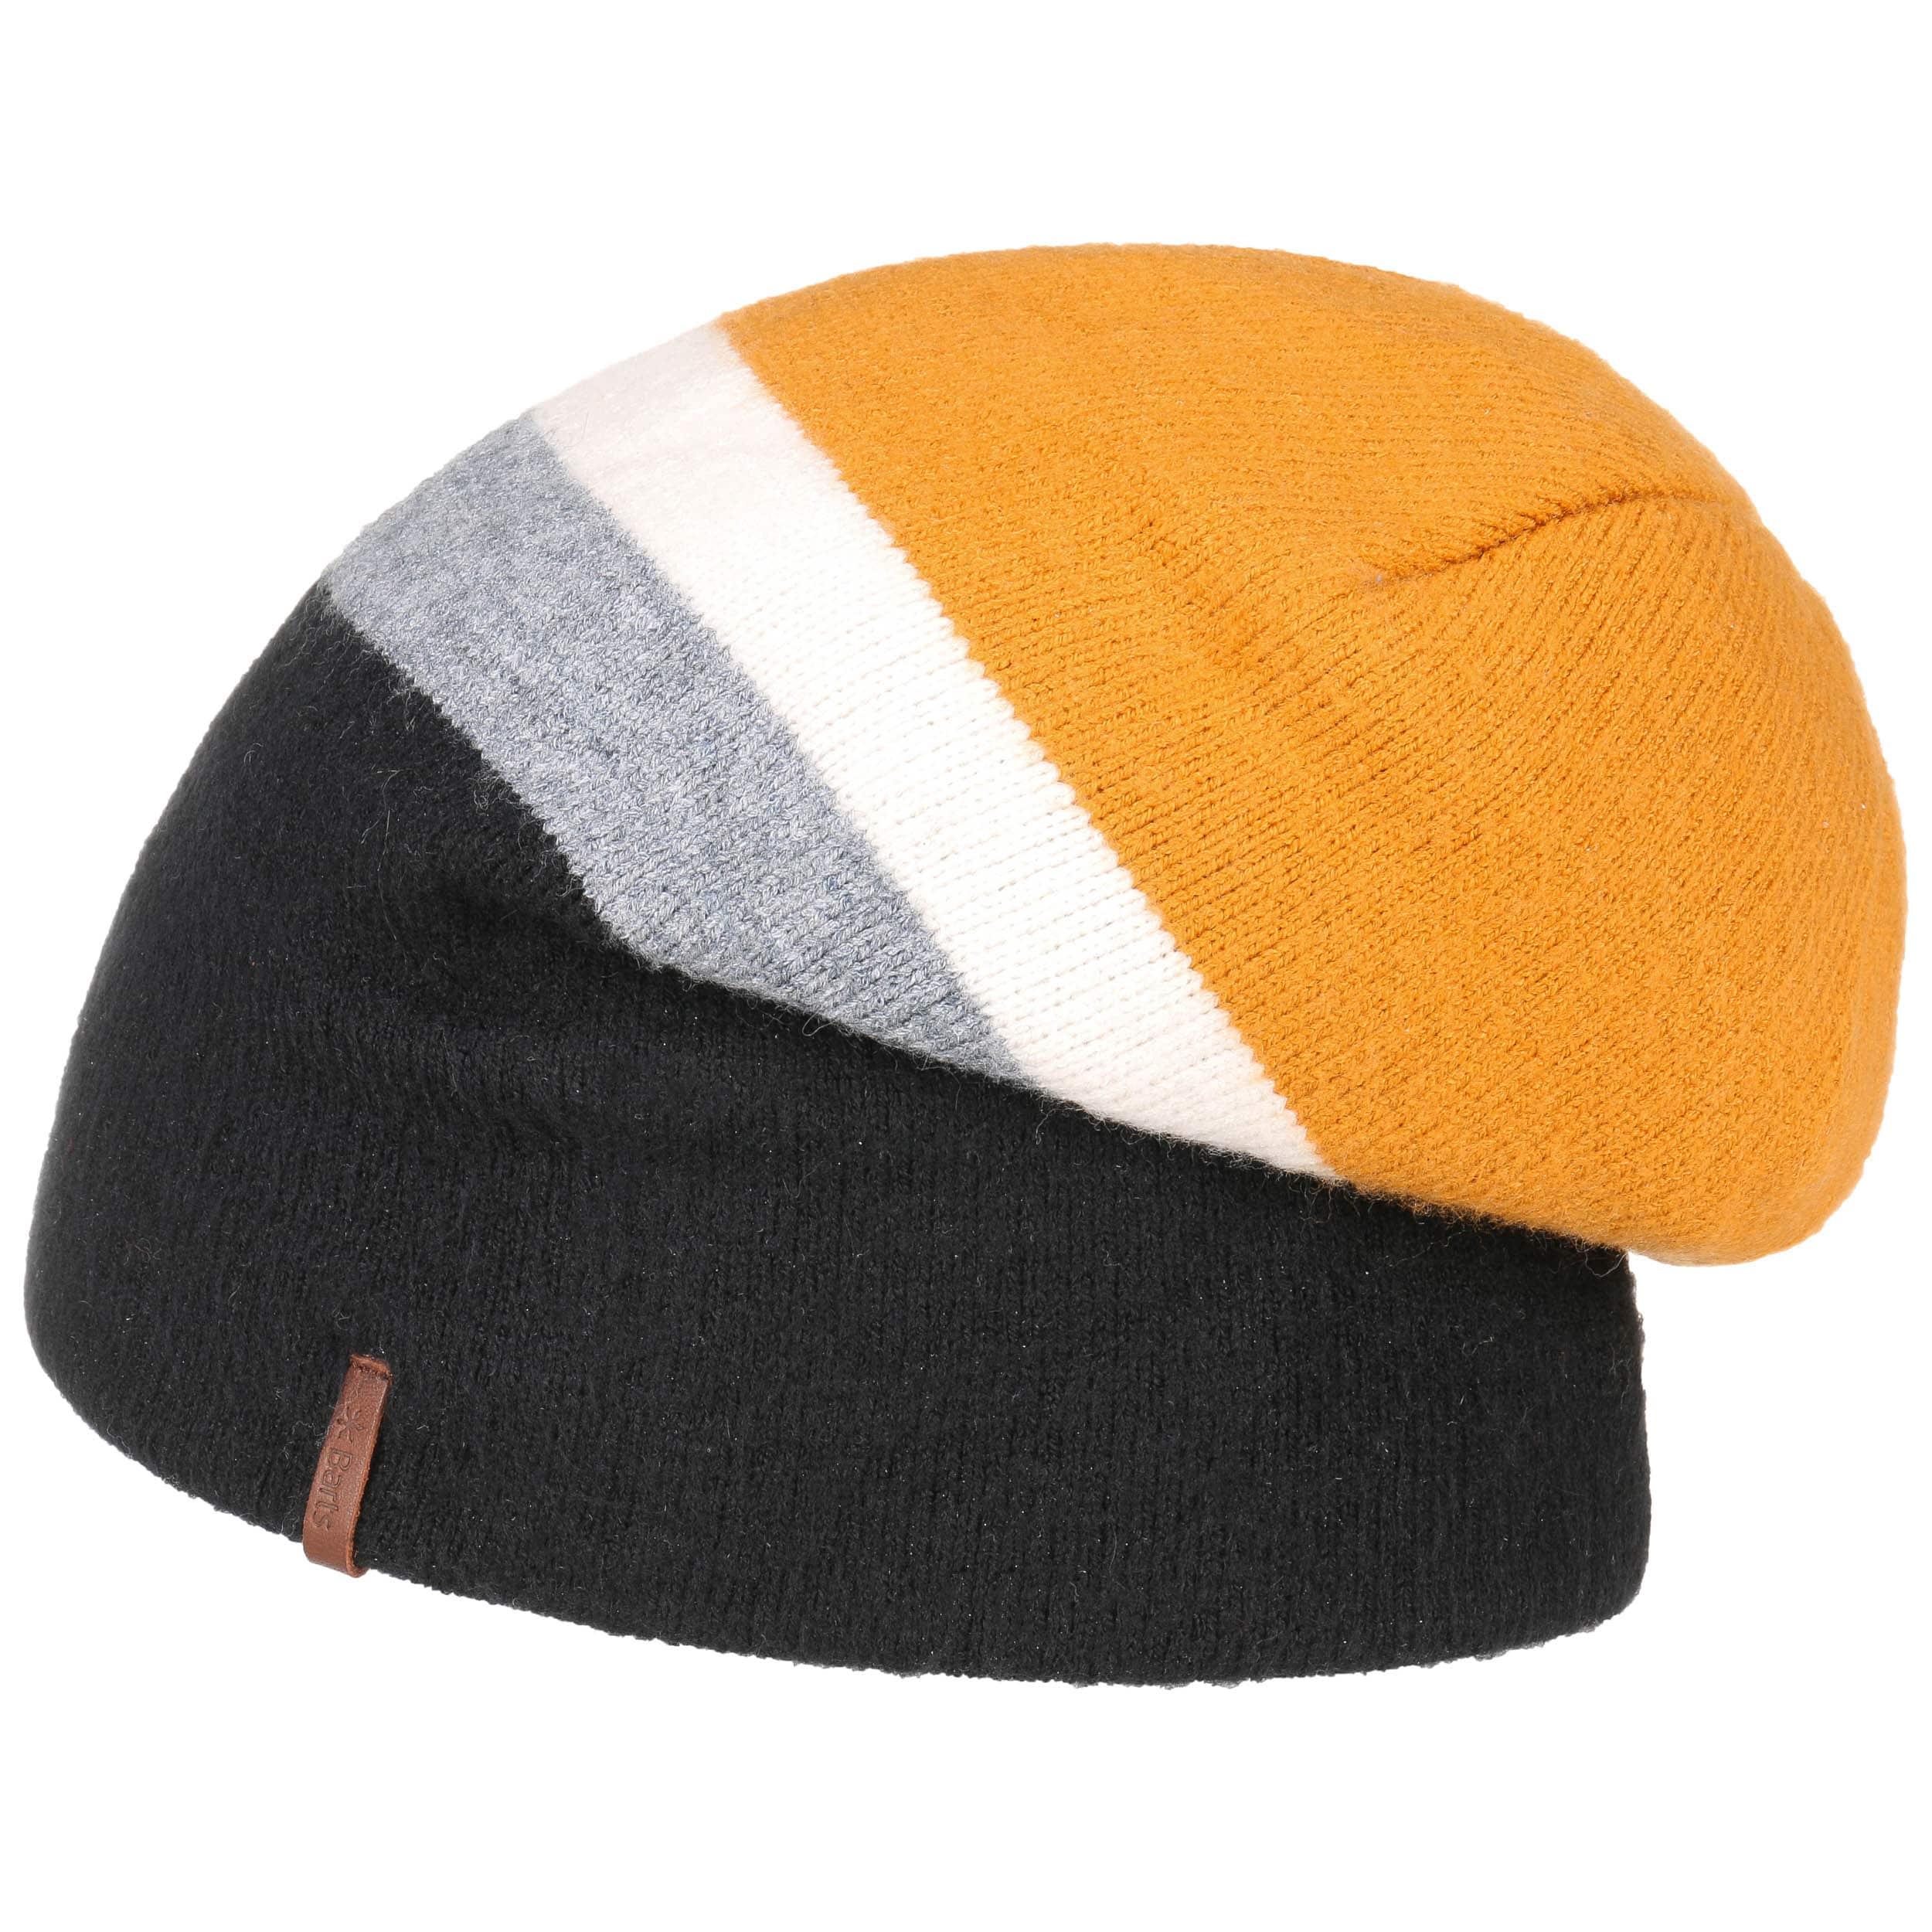 ... Jispen Beanie Hat by Barts - black 4 ac5538aa7826